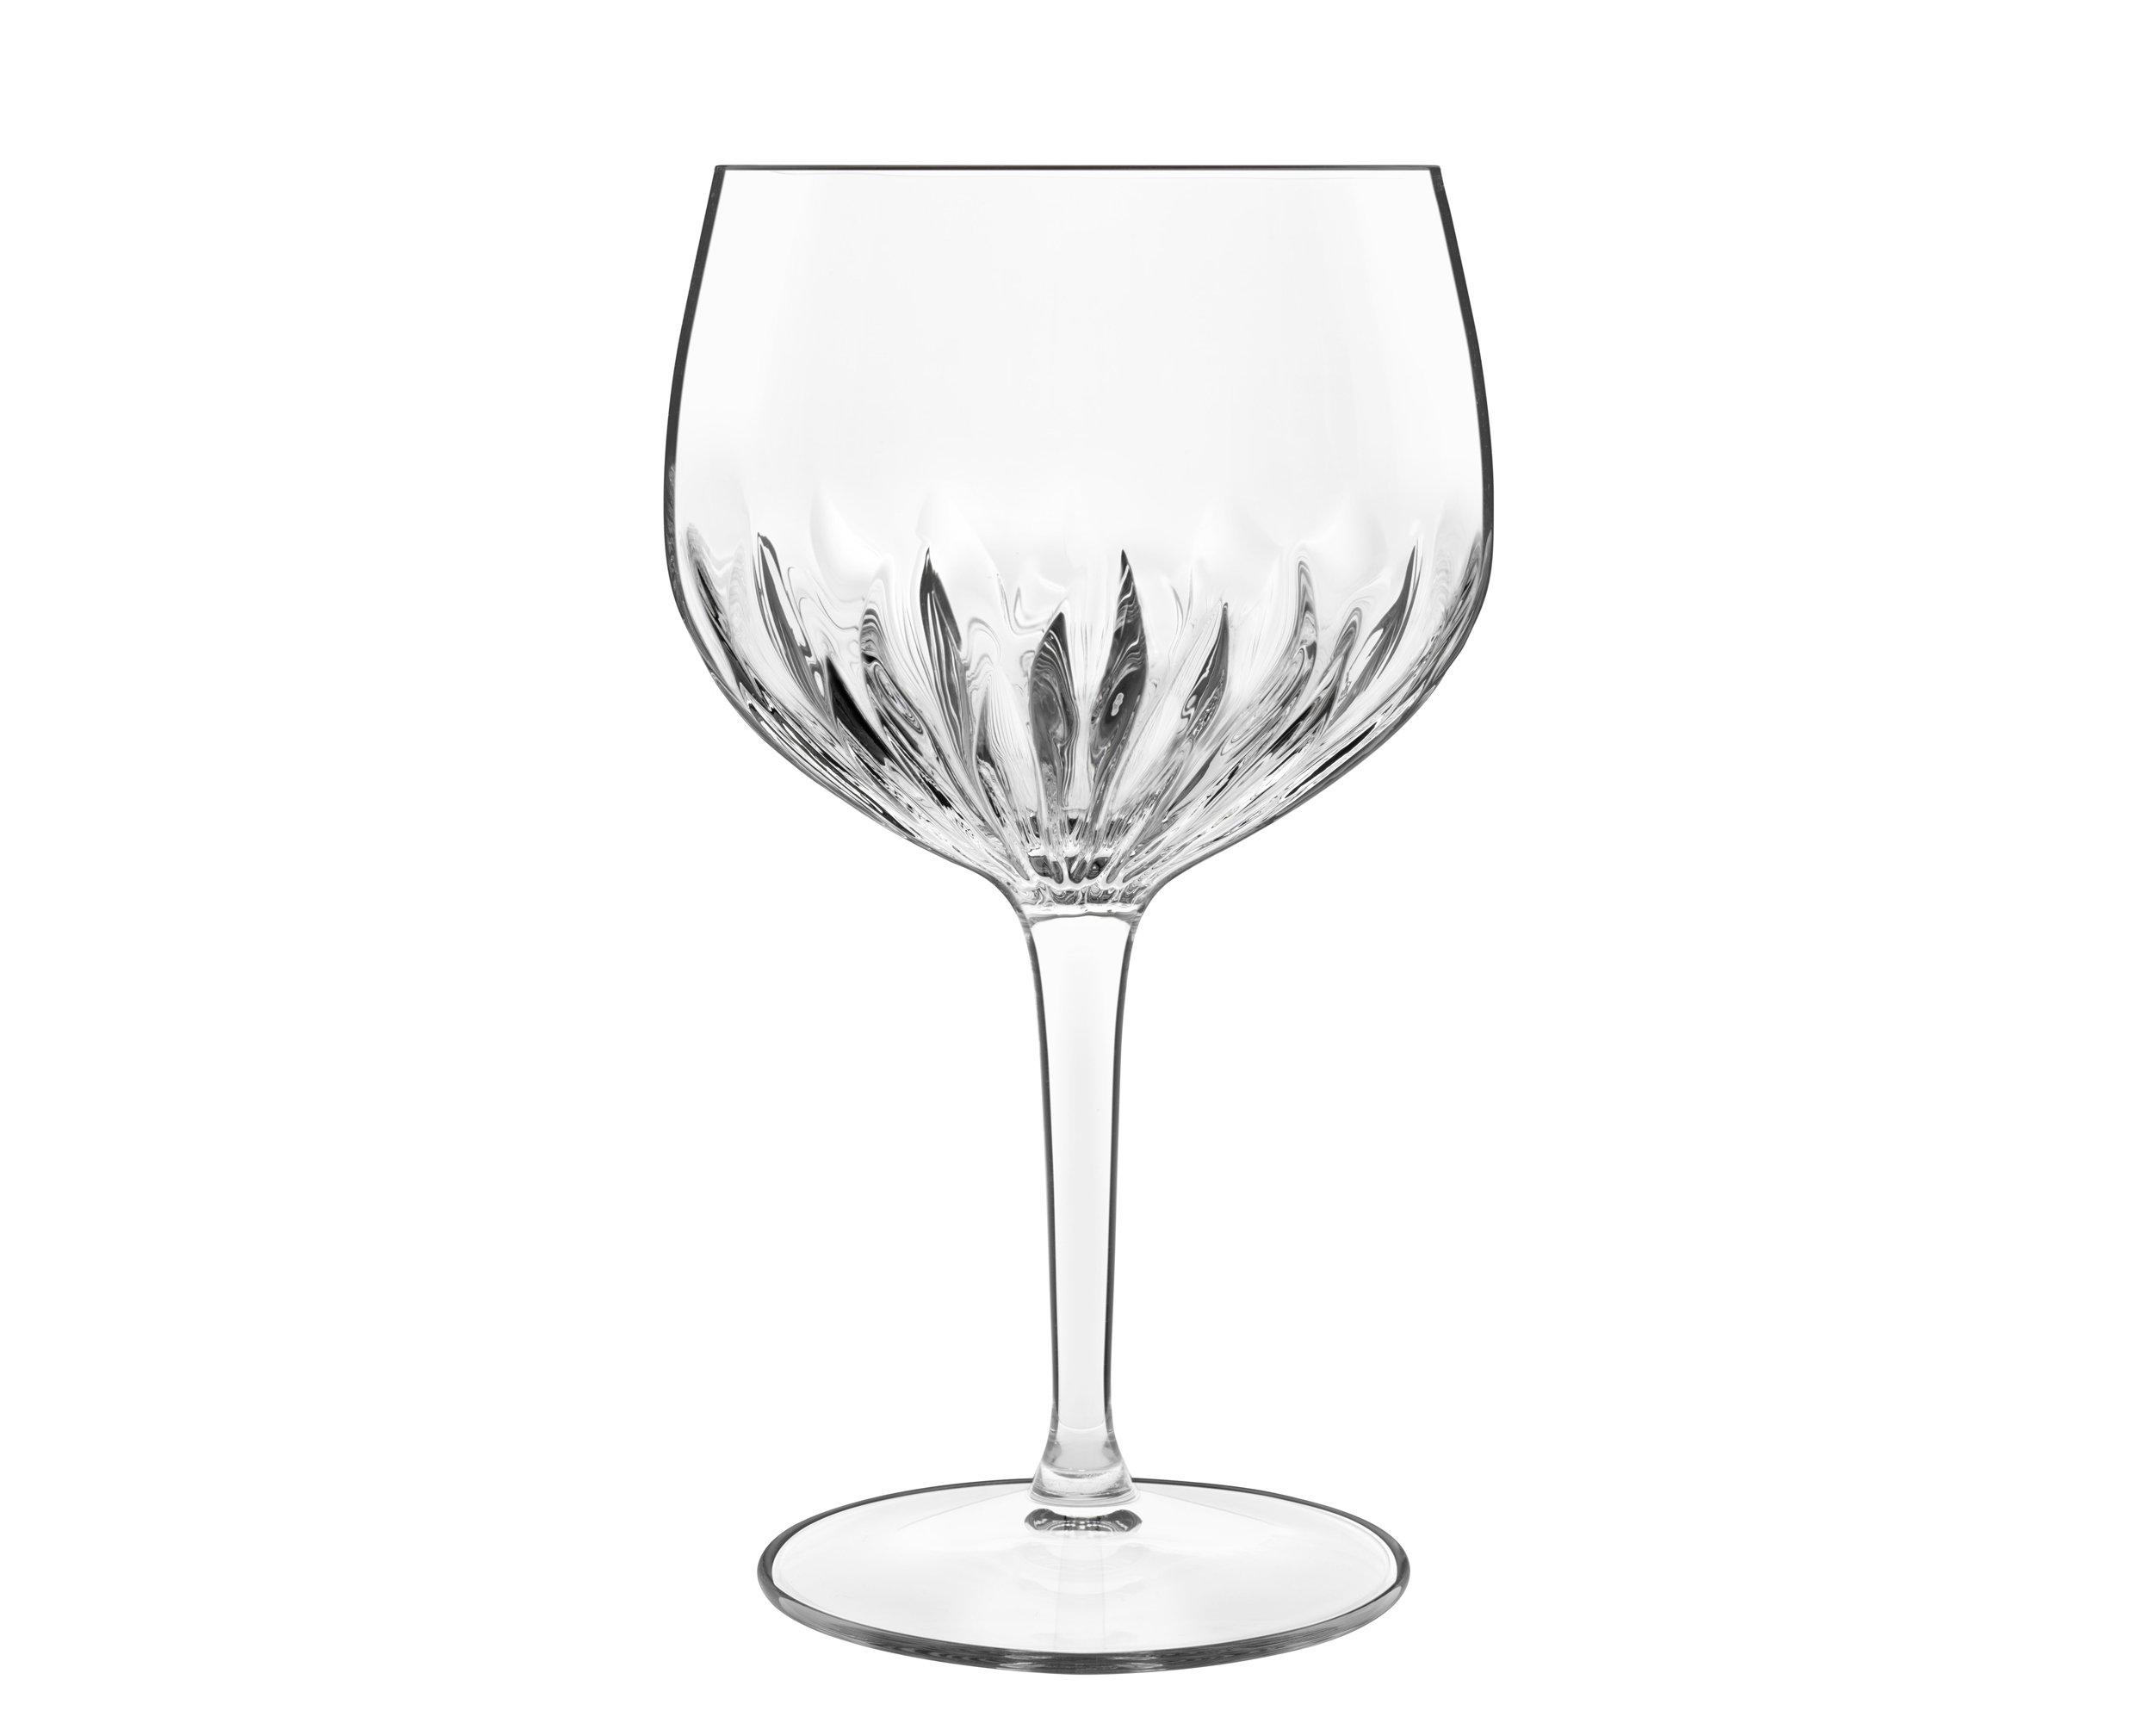 Luigi Bormioli - Mixology Spansk Gin & Tonic Glass 80 cl - 4 pack (12464-02)